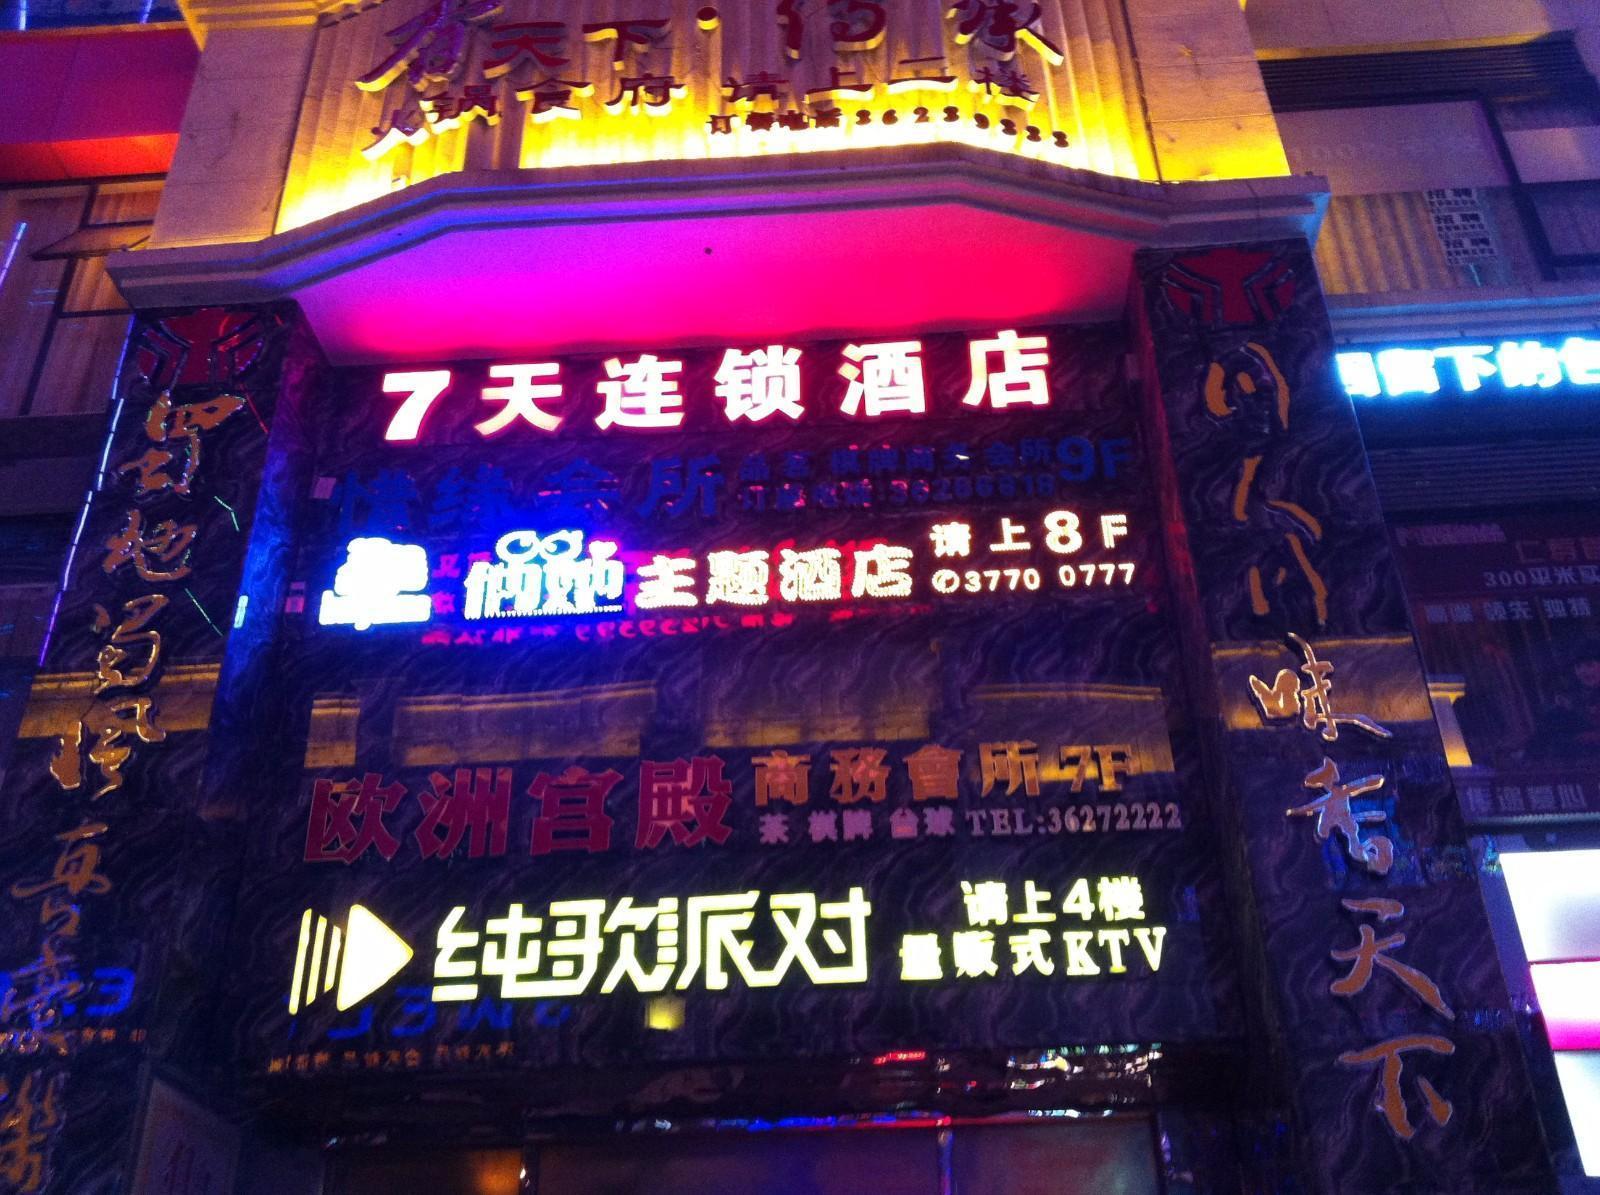 7 Days Inn·Chengdu Renshou European Street, Meishan